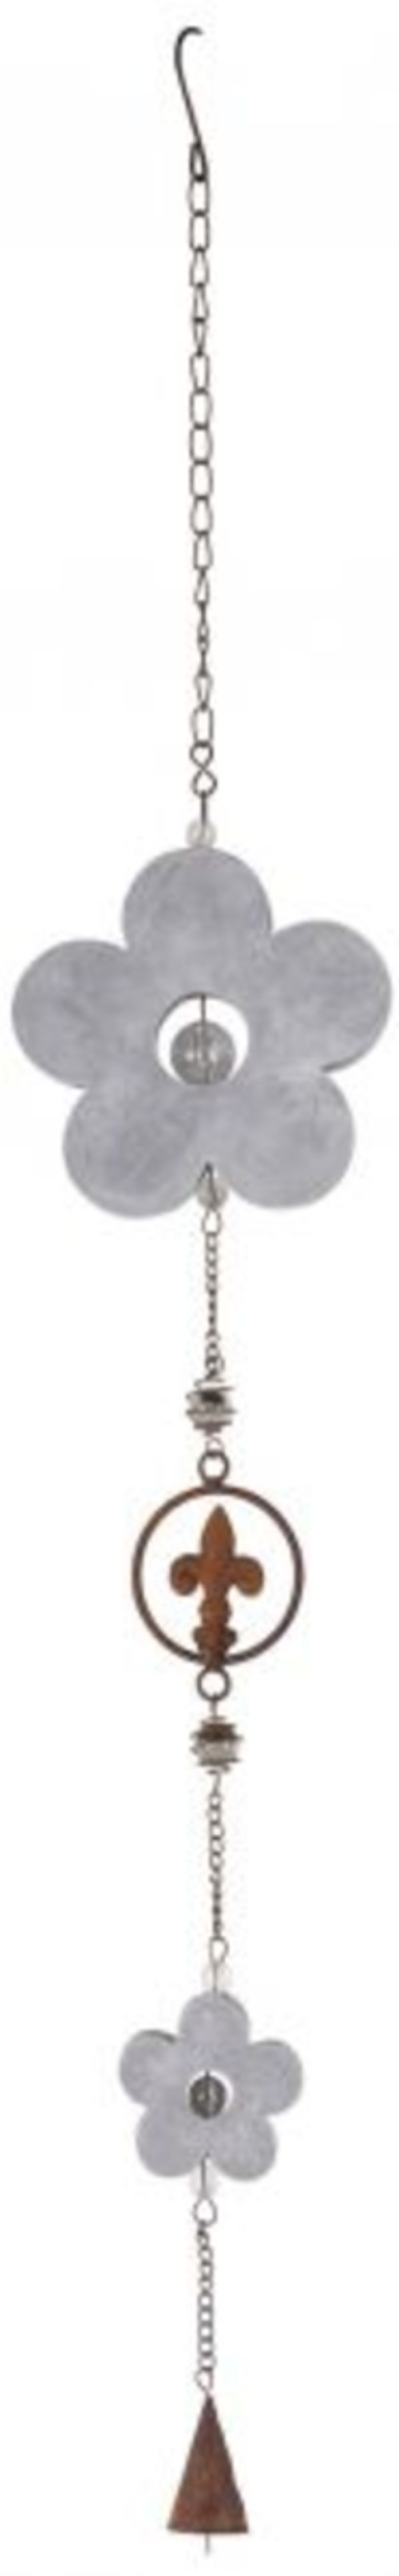 Girlande - aus Metall - 14 x 2,5 x 90 cm